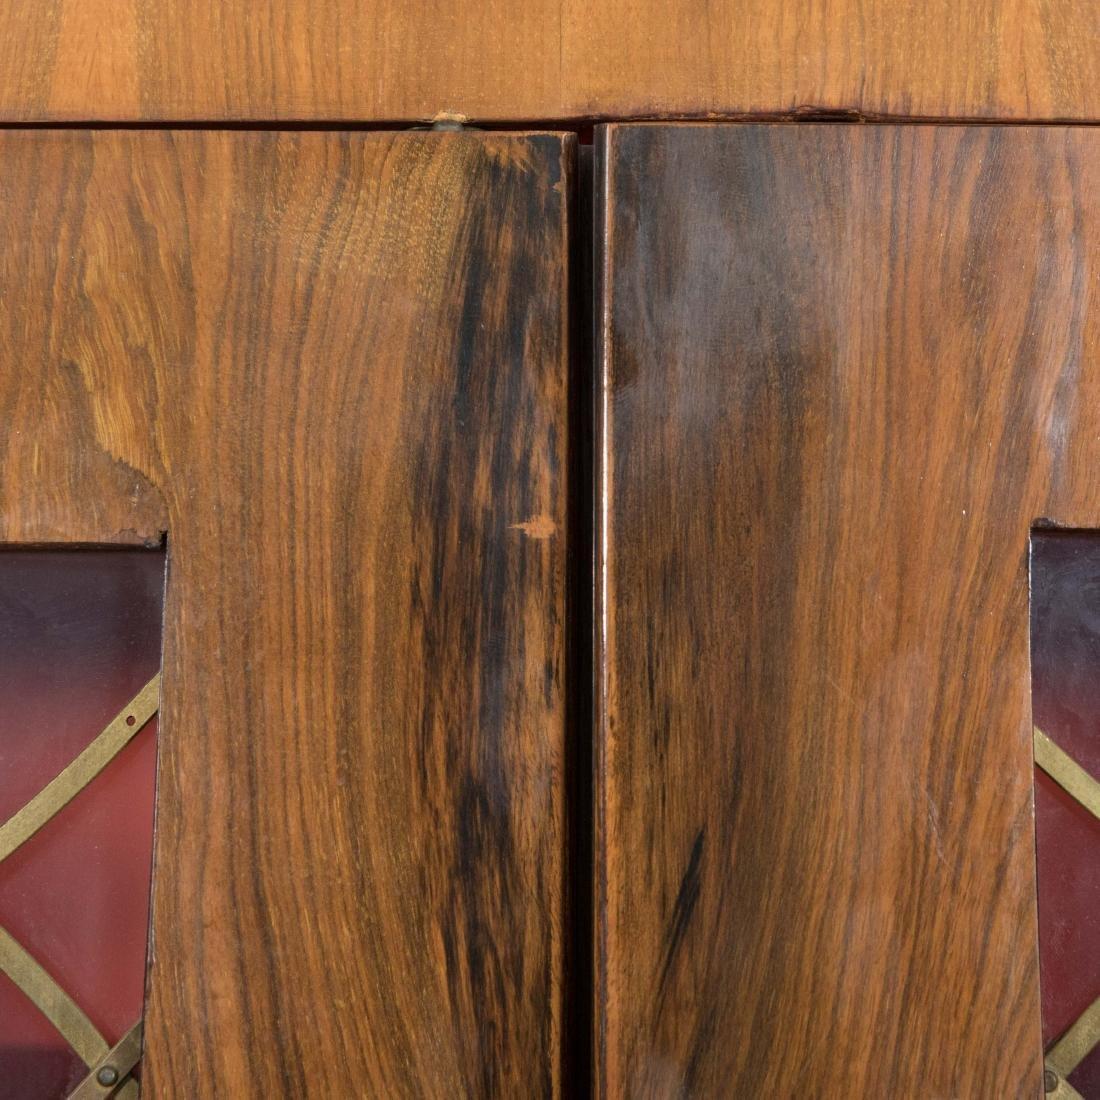 Burled English Art Deco Armoire - Epstein Brothers - 7